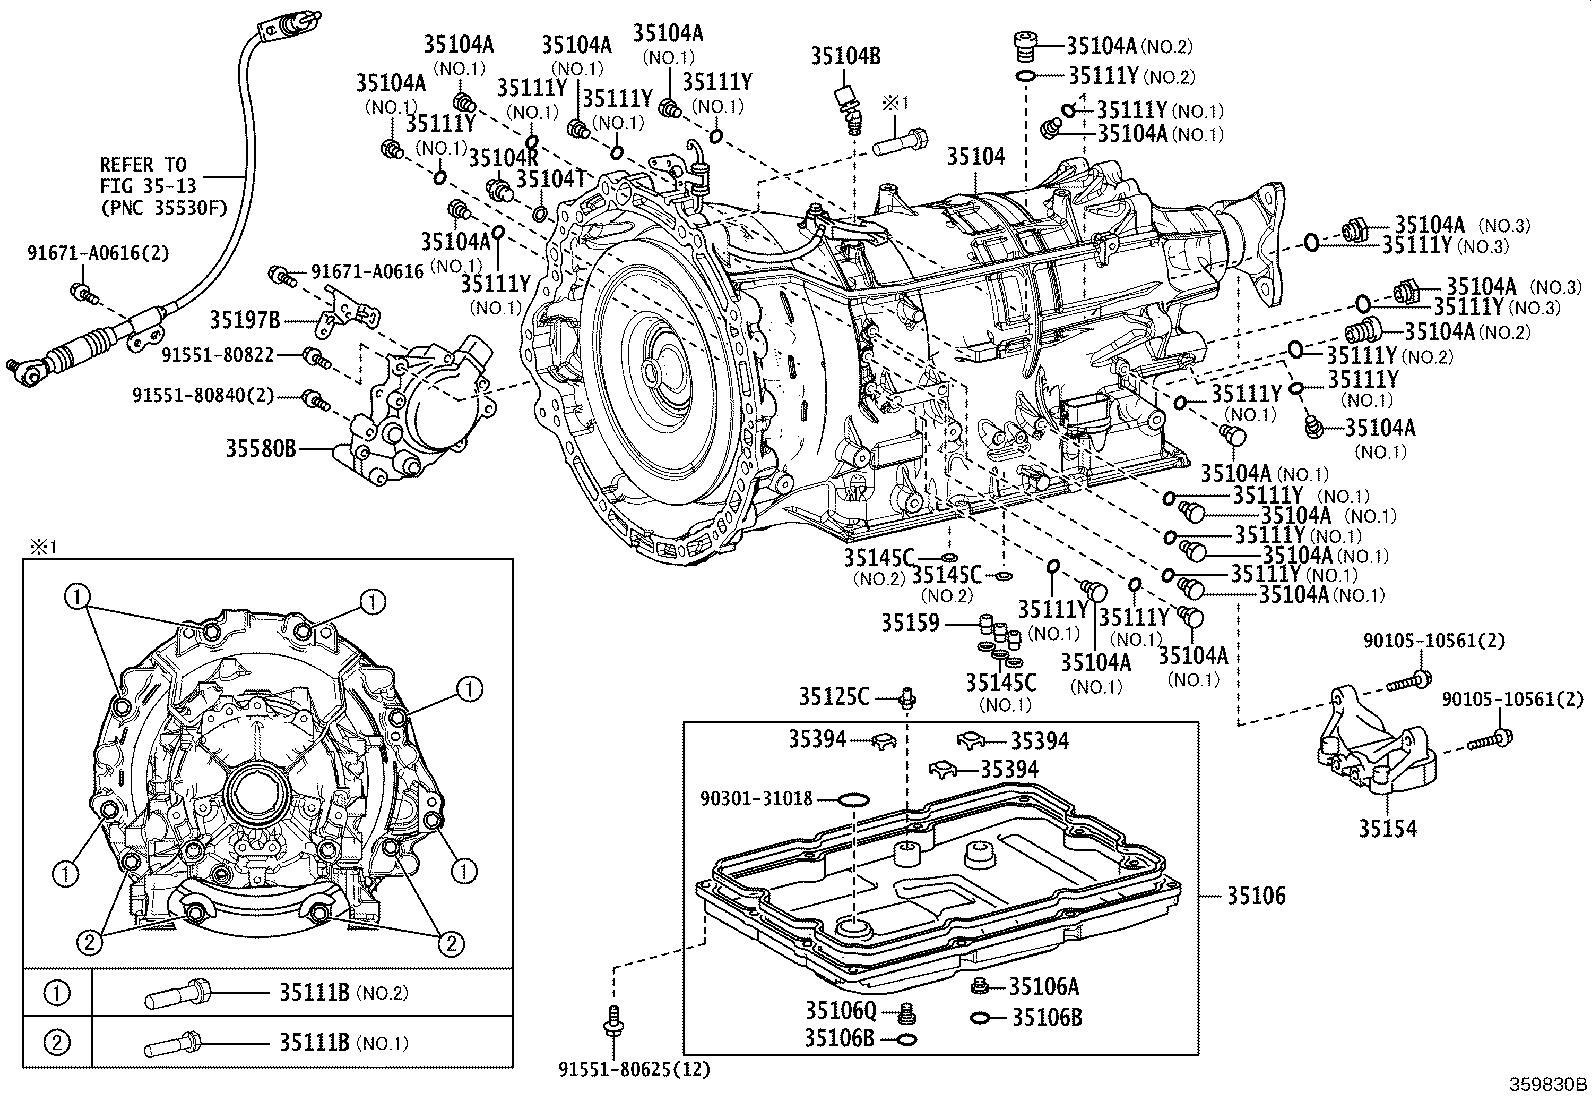 Lexus Lc 500 Plug Plug Sub Assembly Drain Atm For